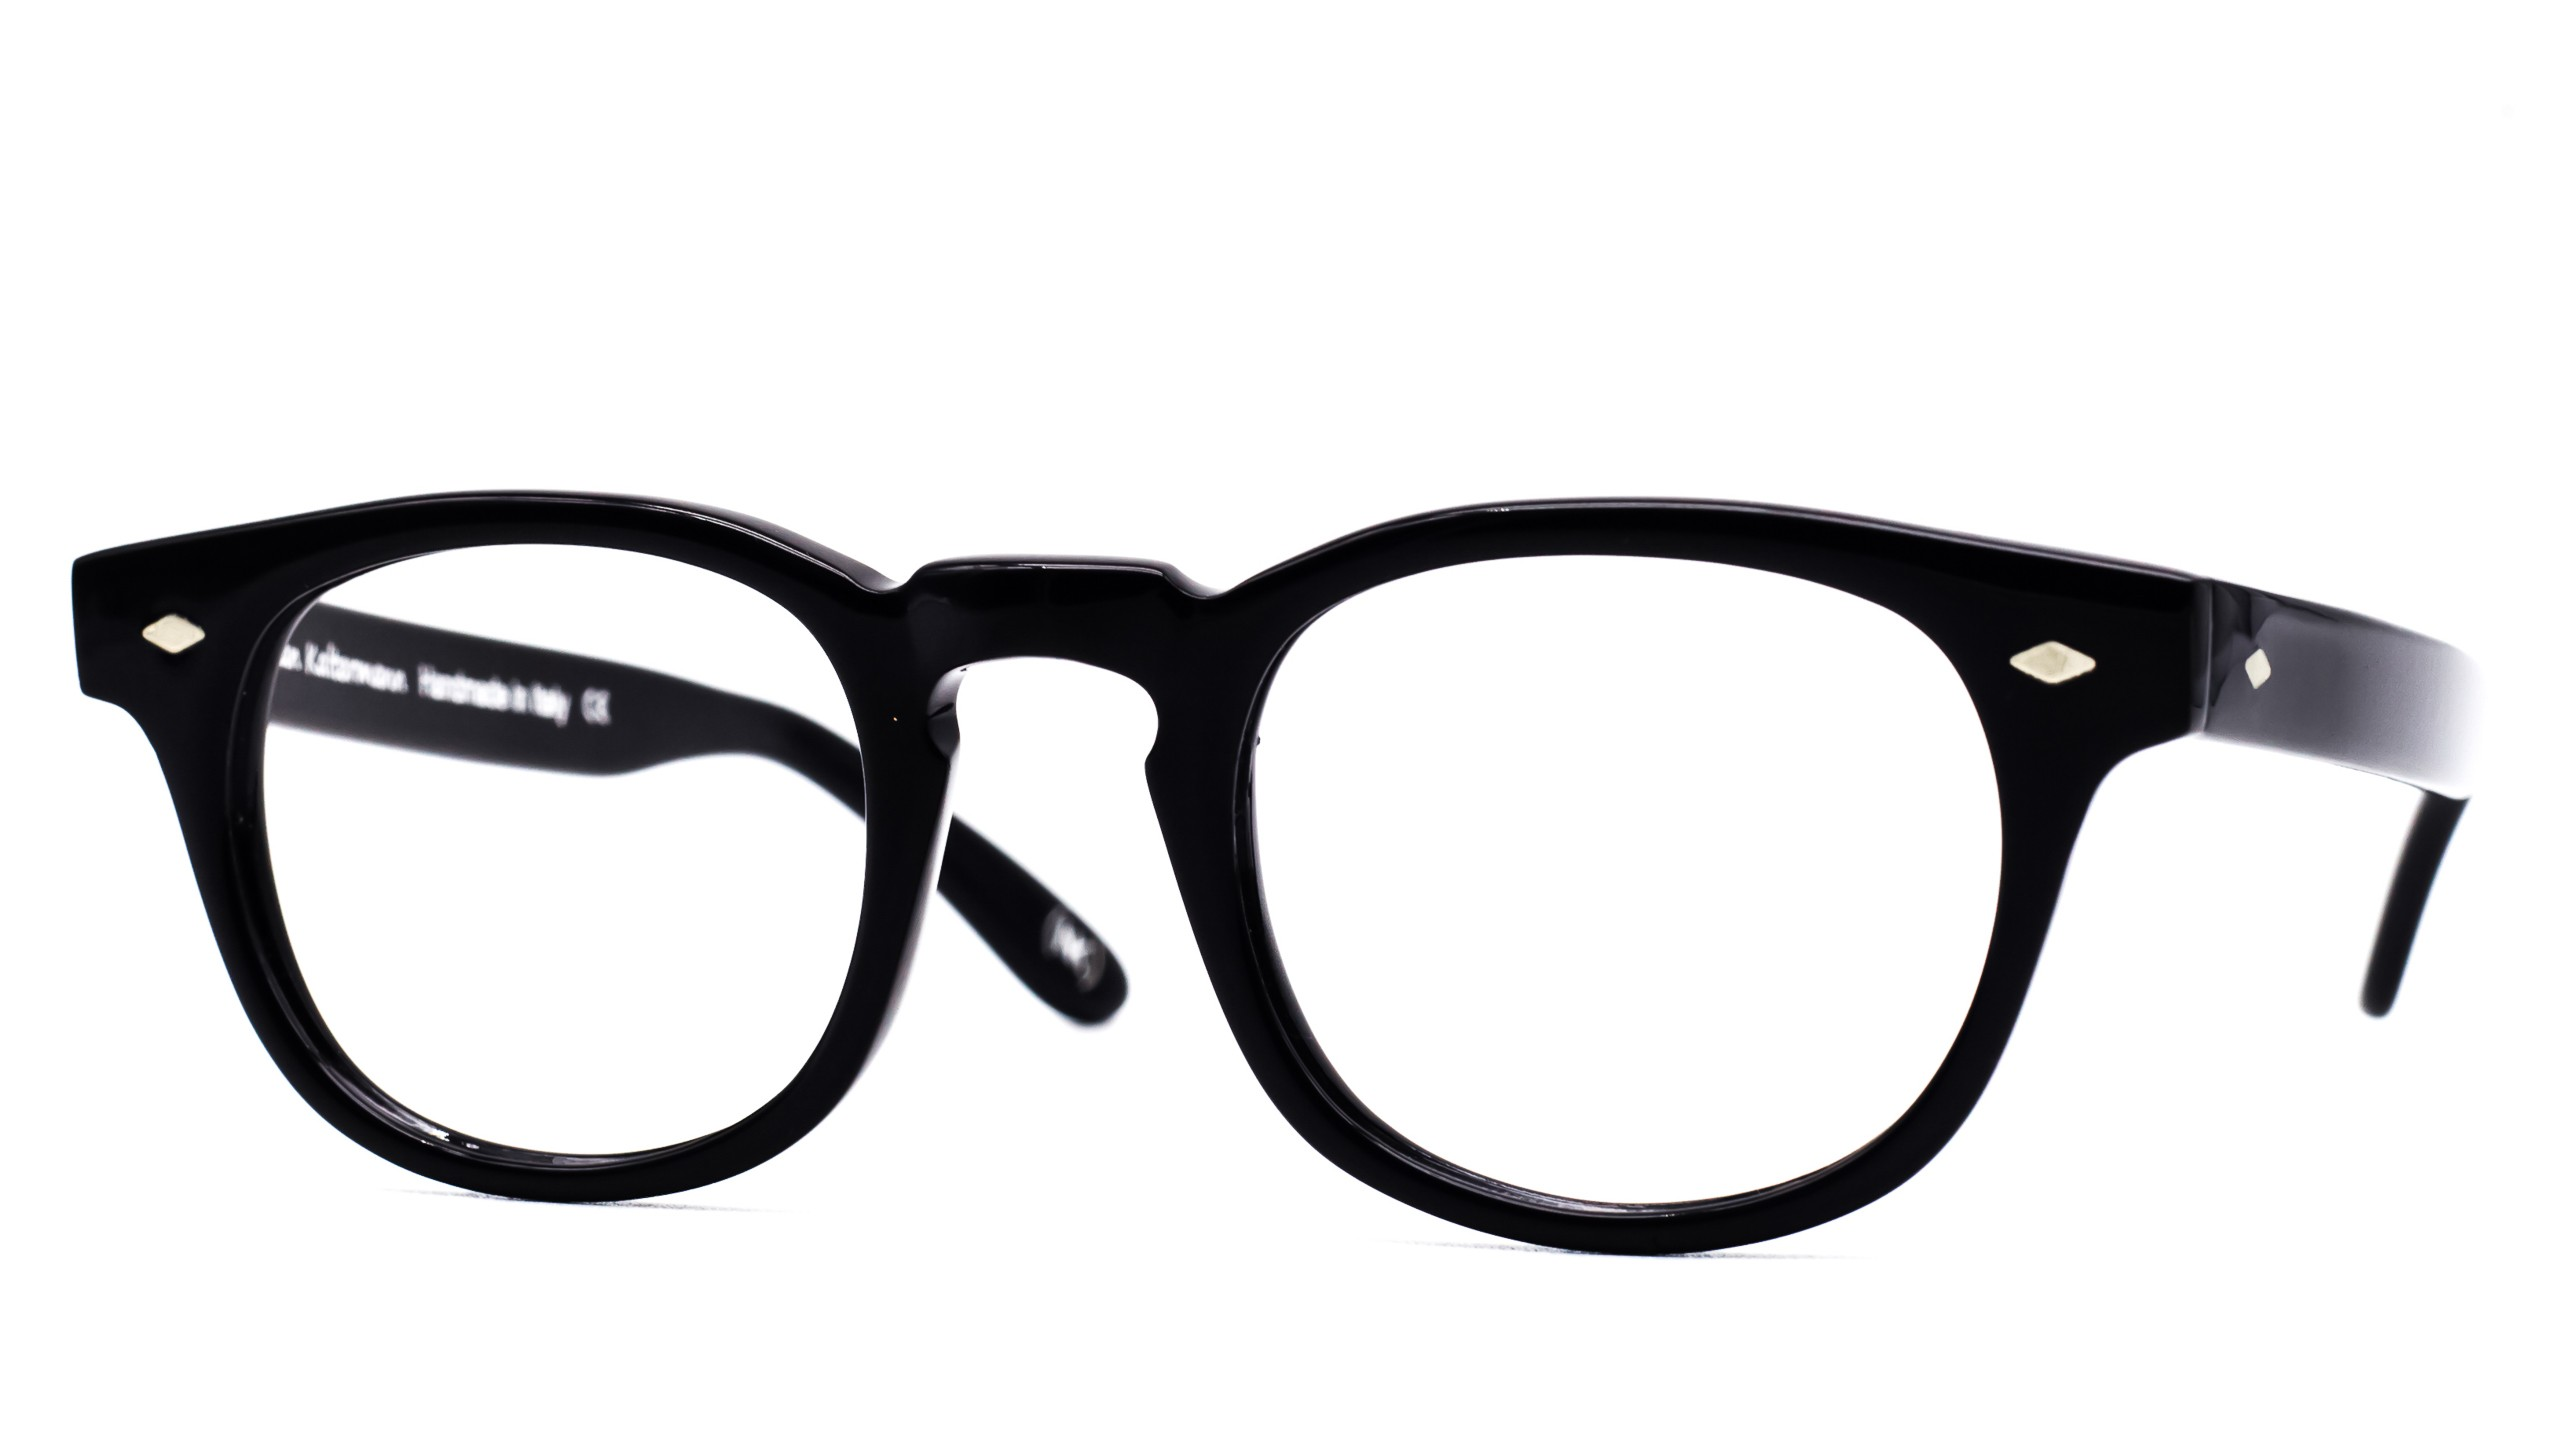 eyeglasses-Nathan-Kaltermann-made-in-Italy-Franz-C01-Vista2